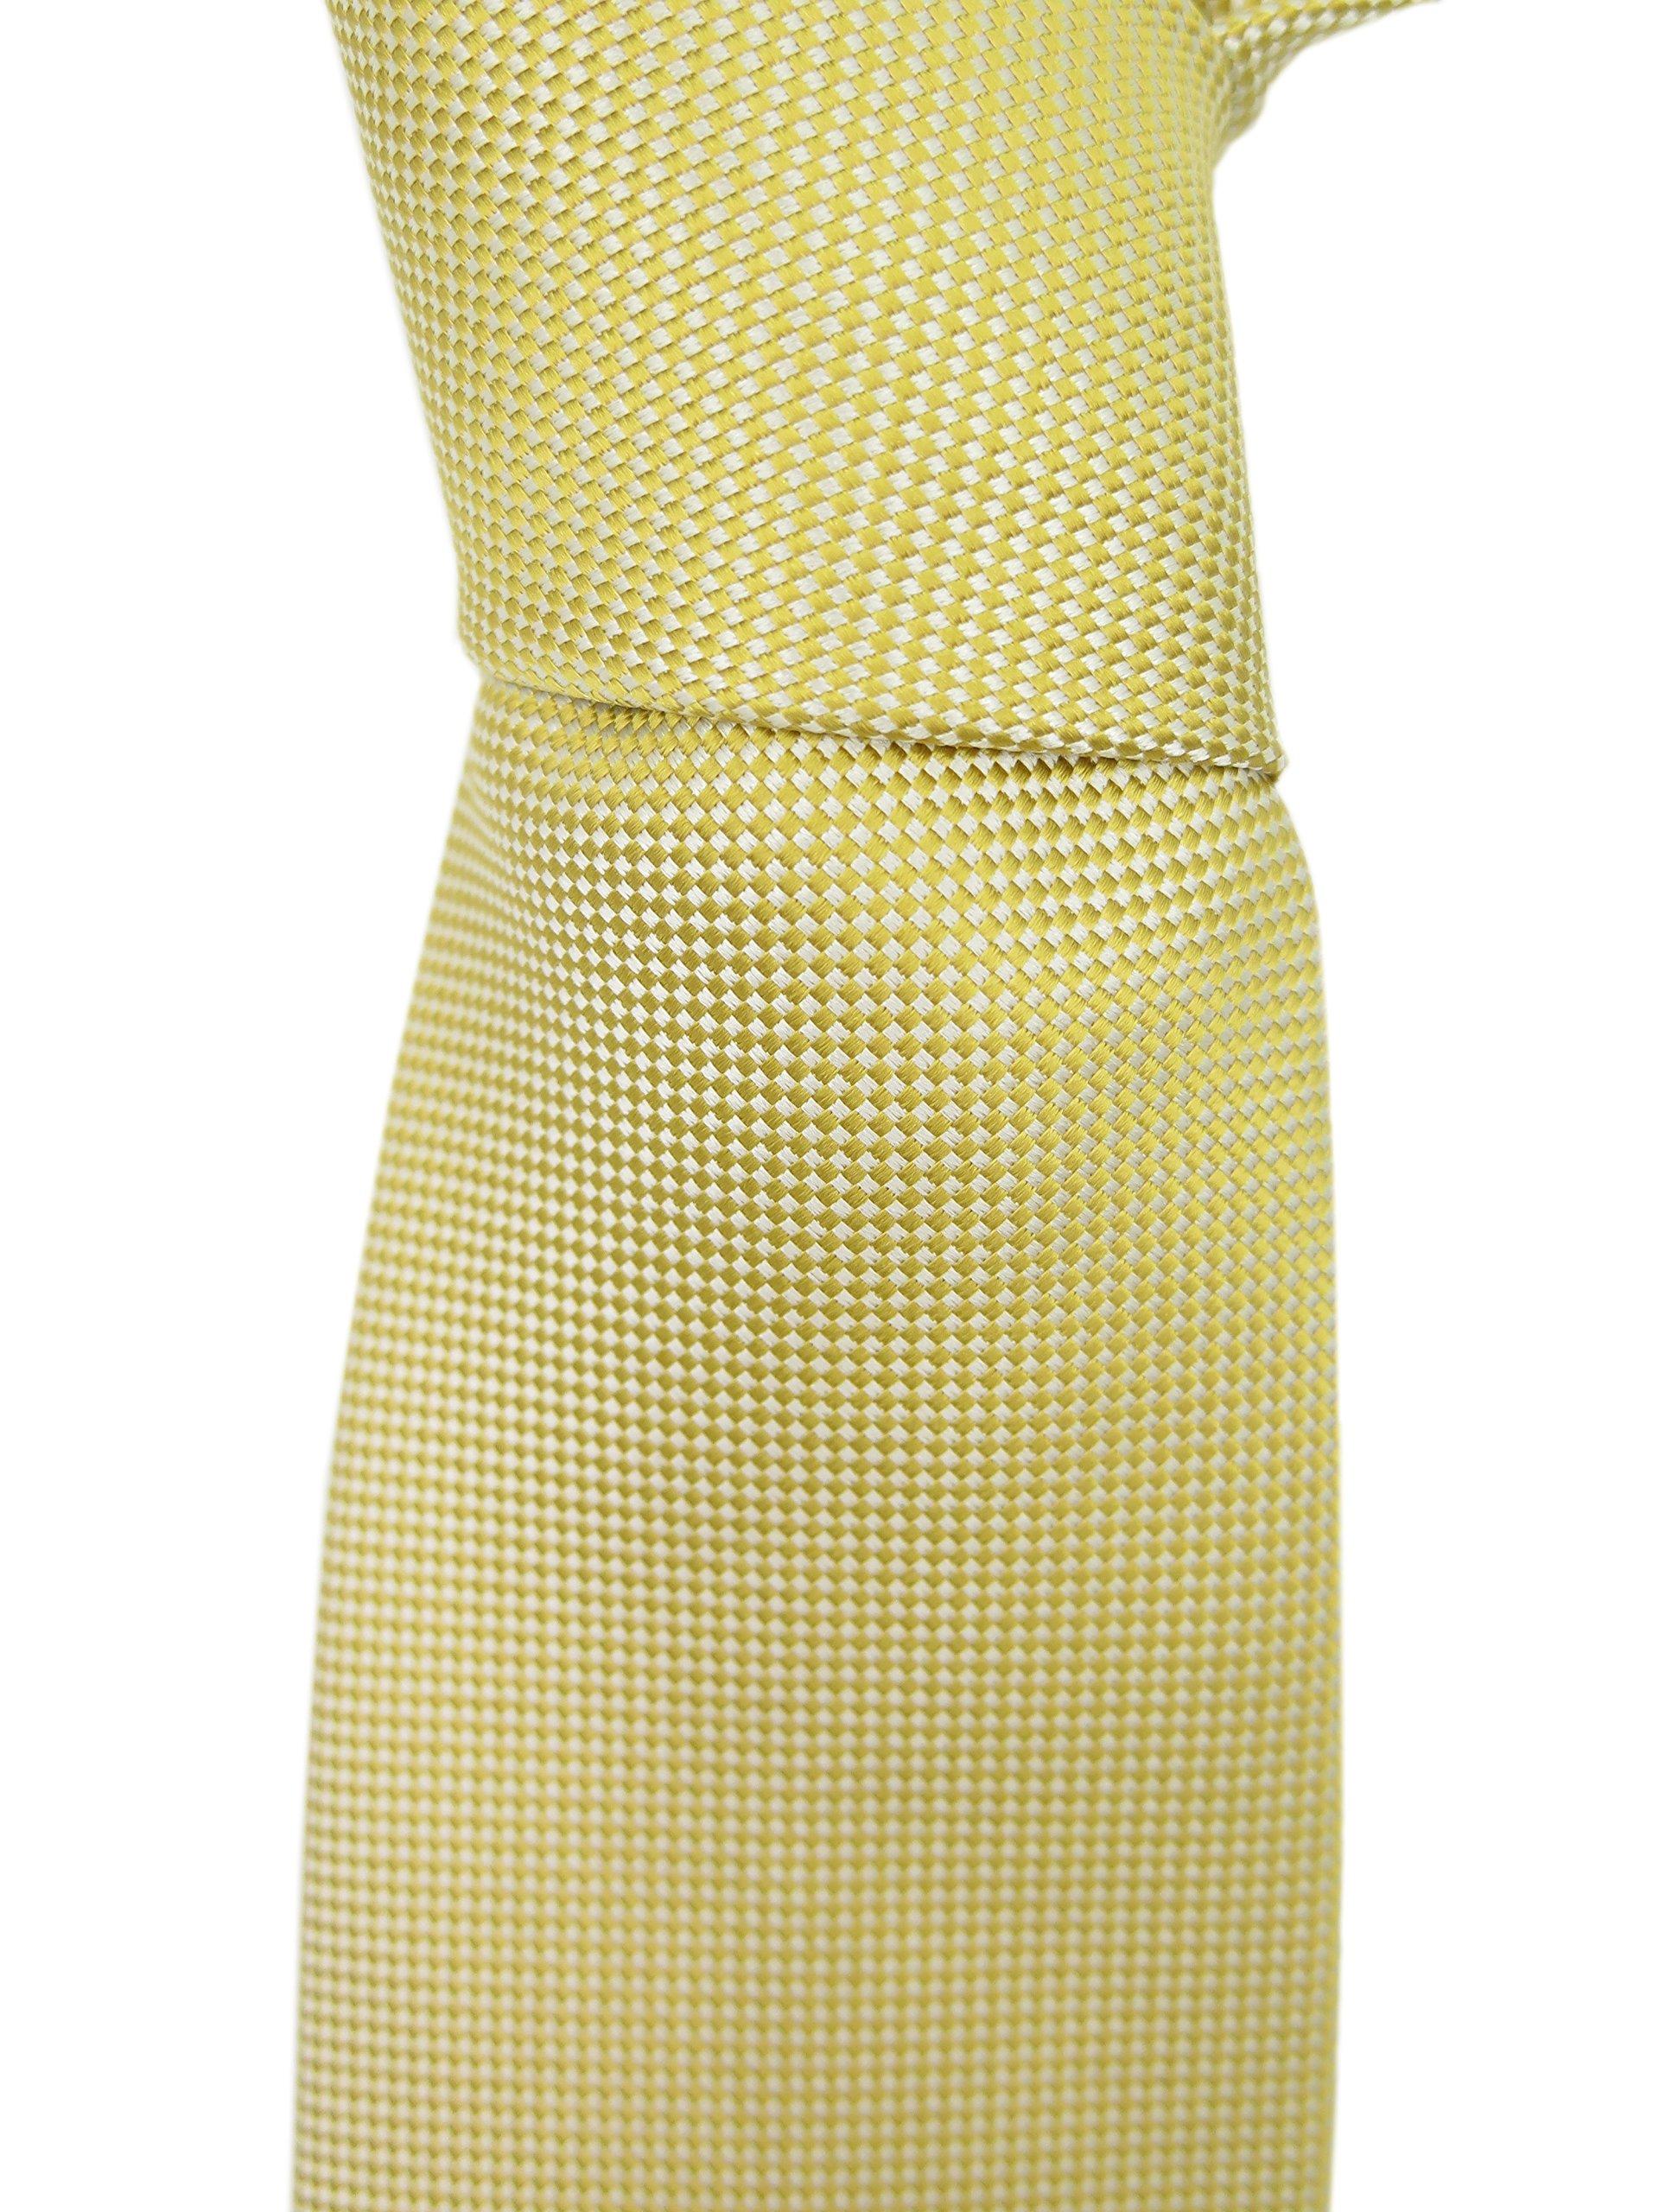 Ermenegildo Zegna Men's Light Gold Silk Neck Tie